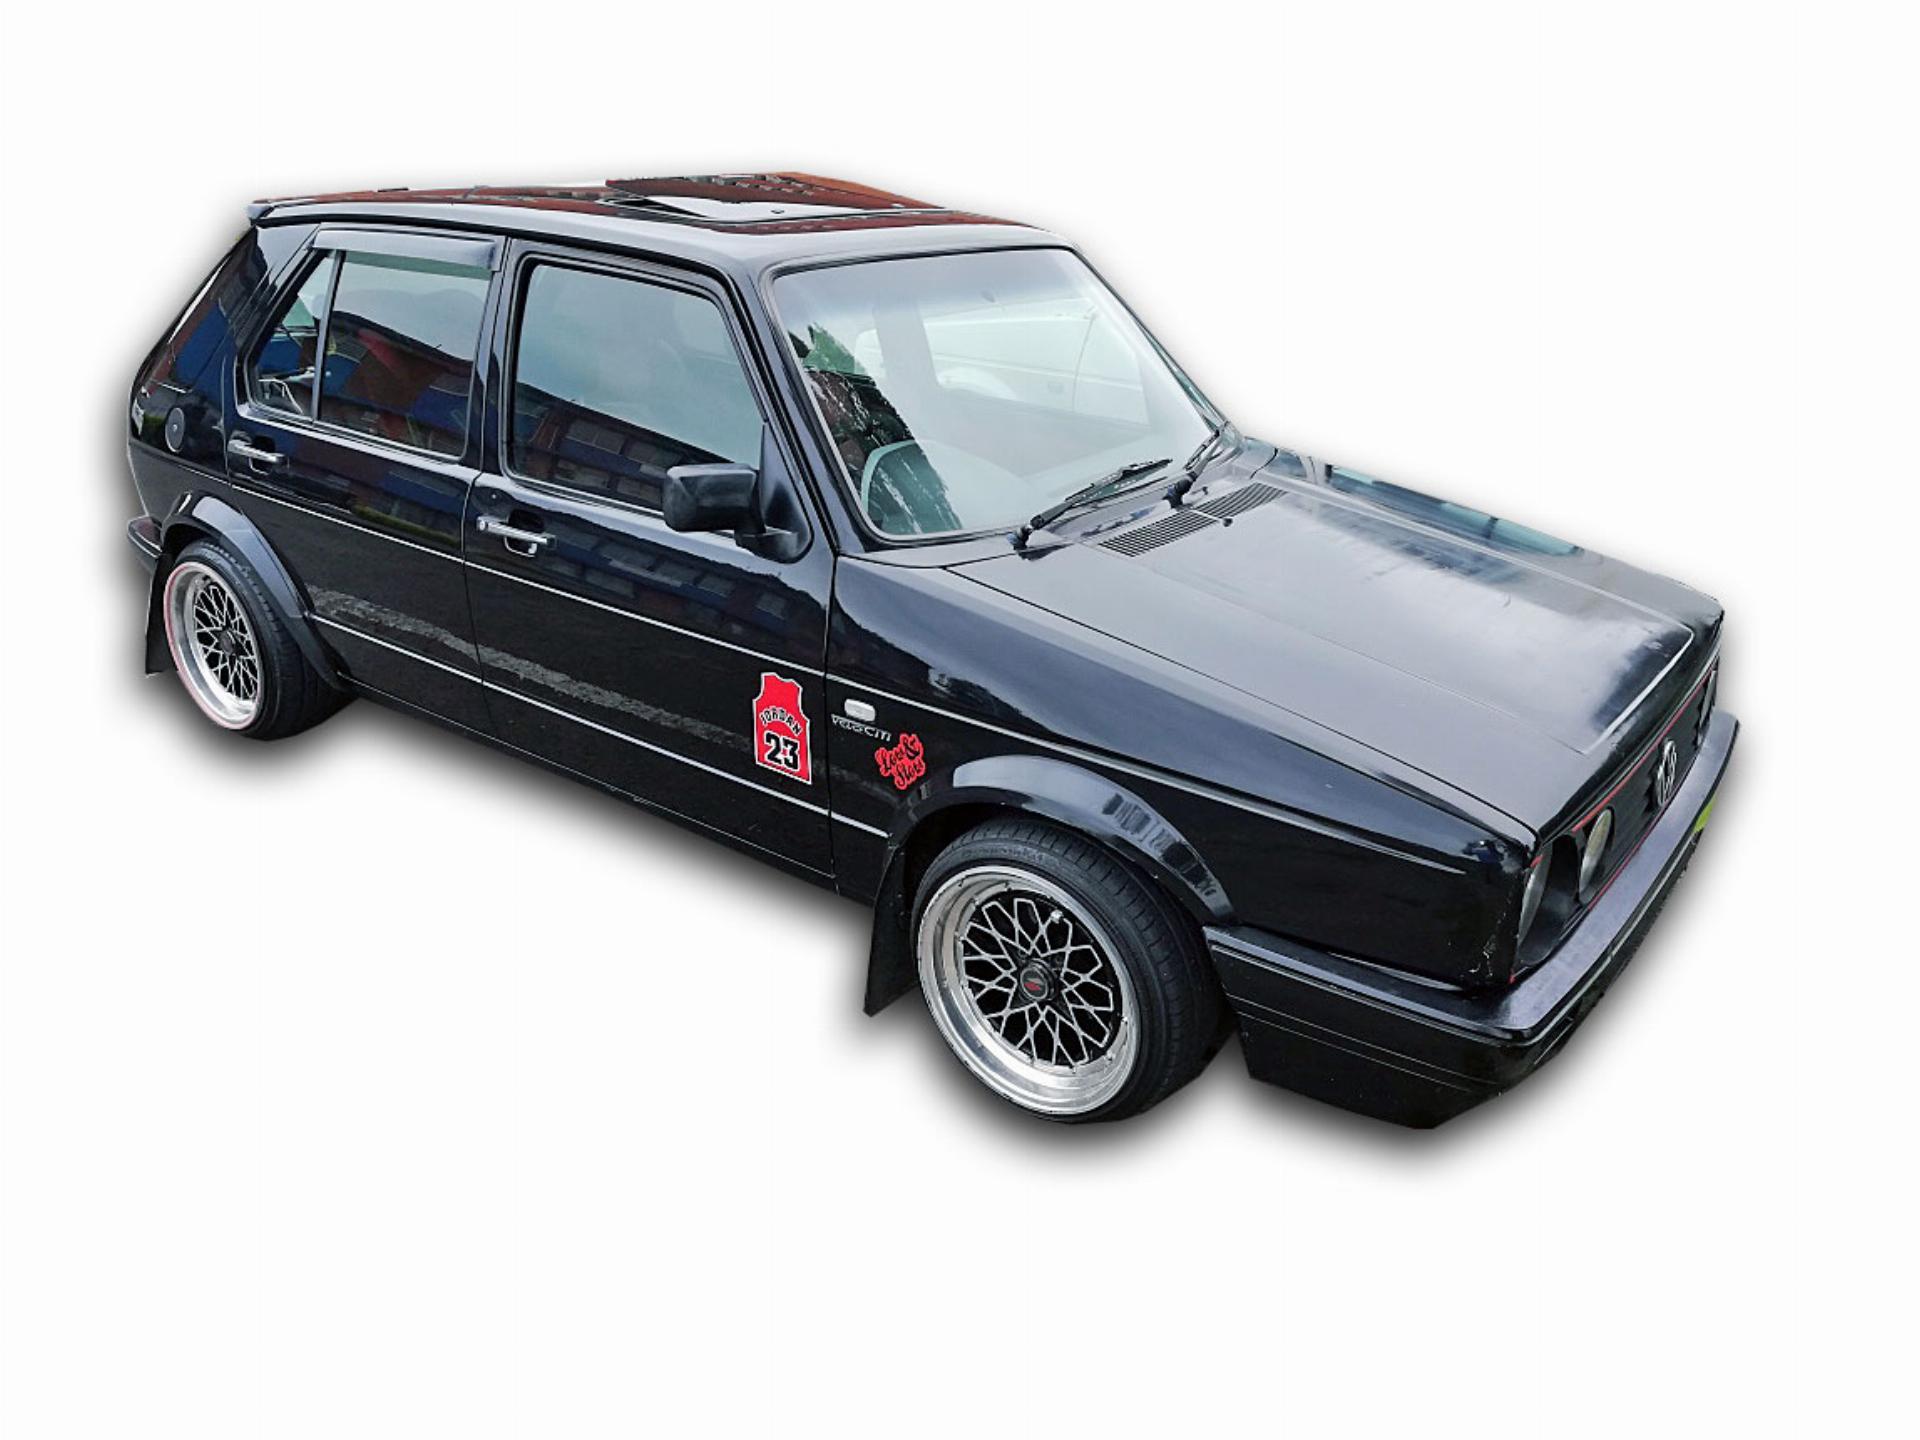 VW Citi Golf 1.4I Citi